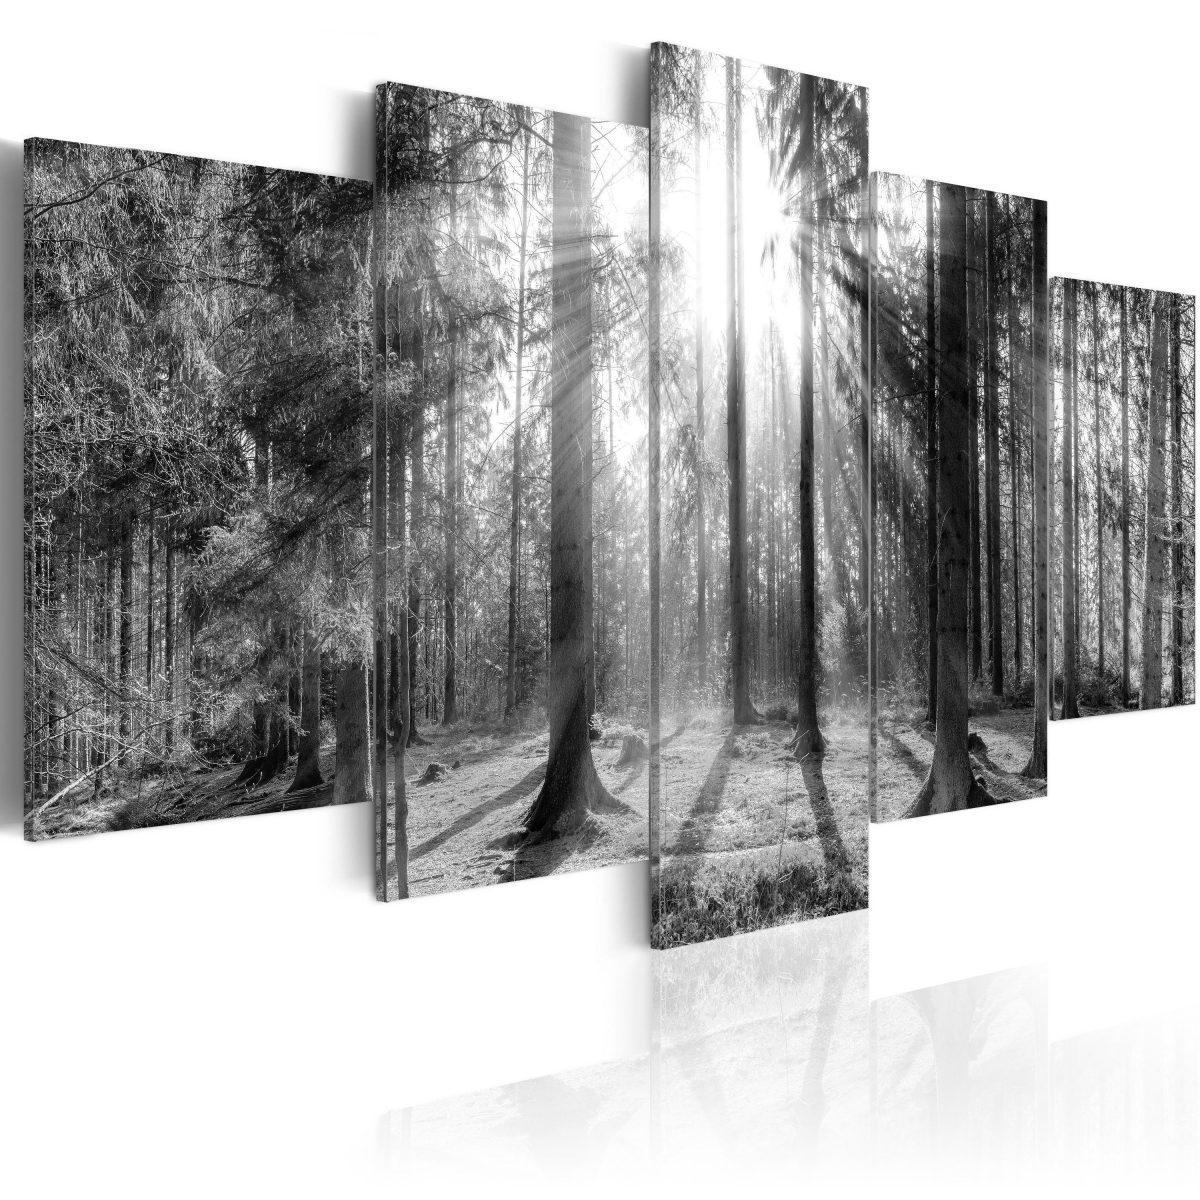 Canvas Tavla - Forest of Memories - 100x50